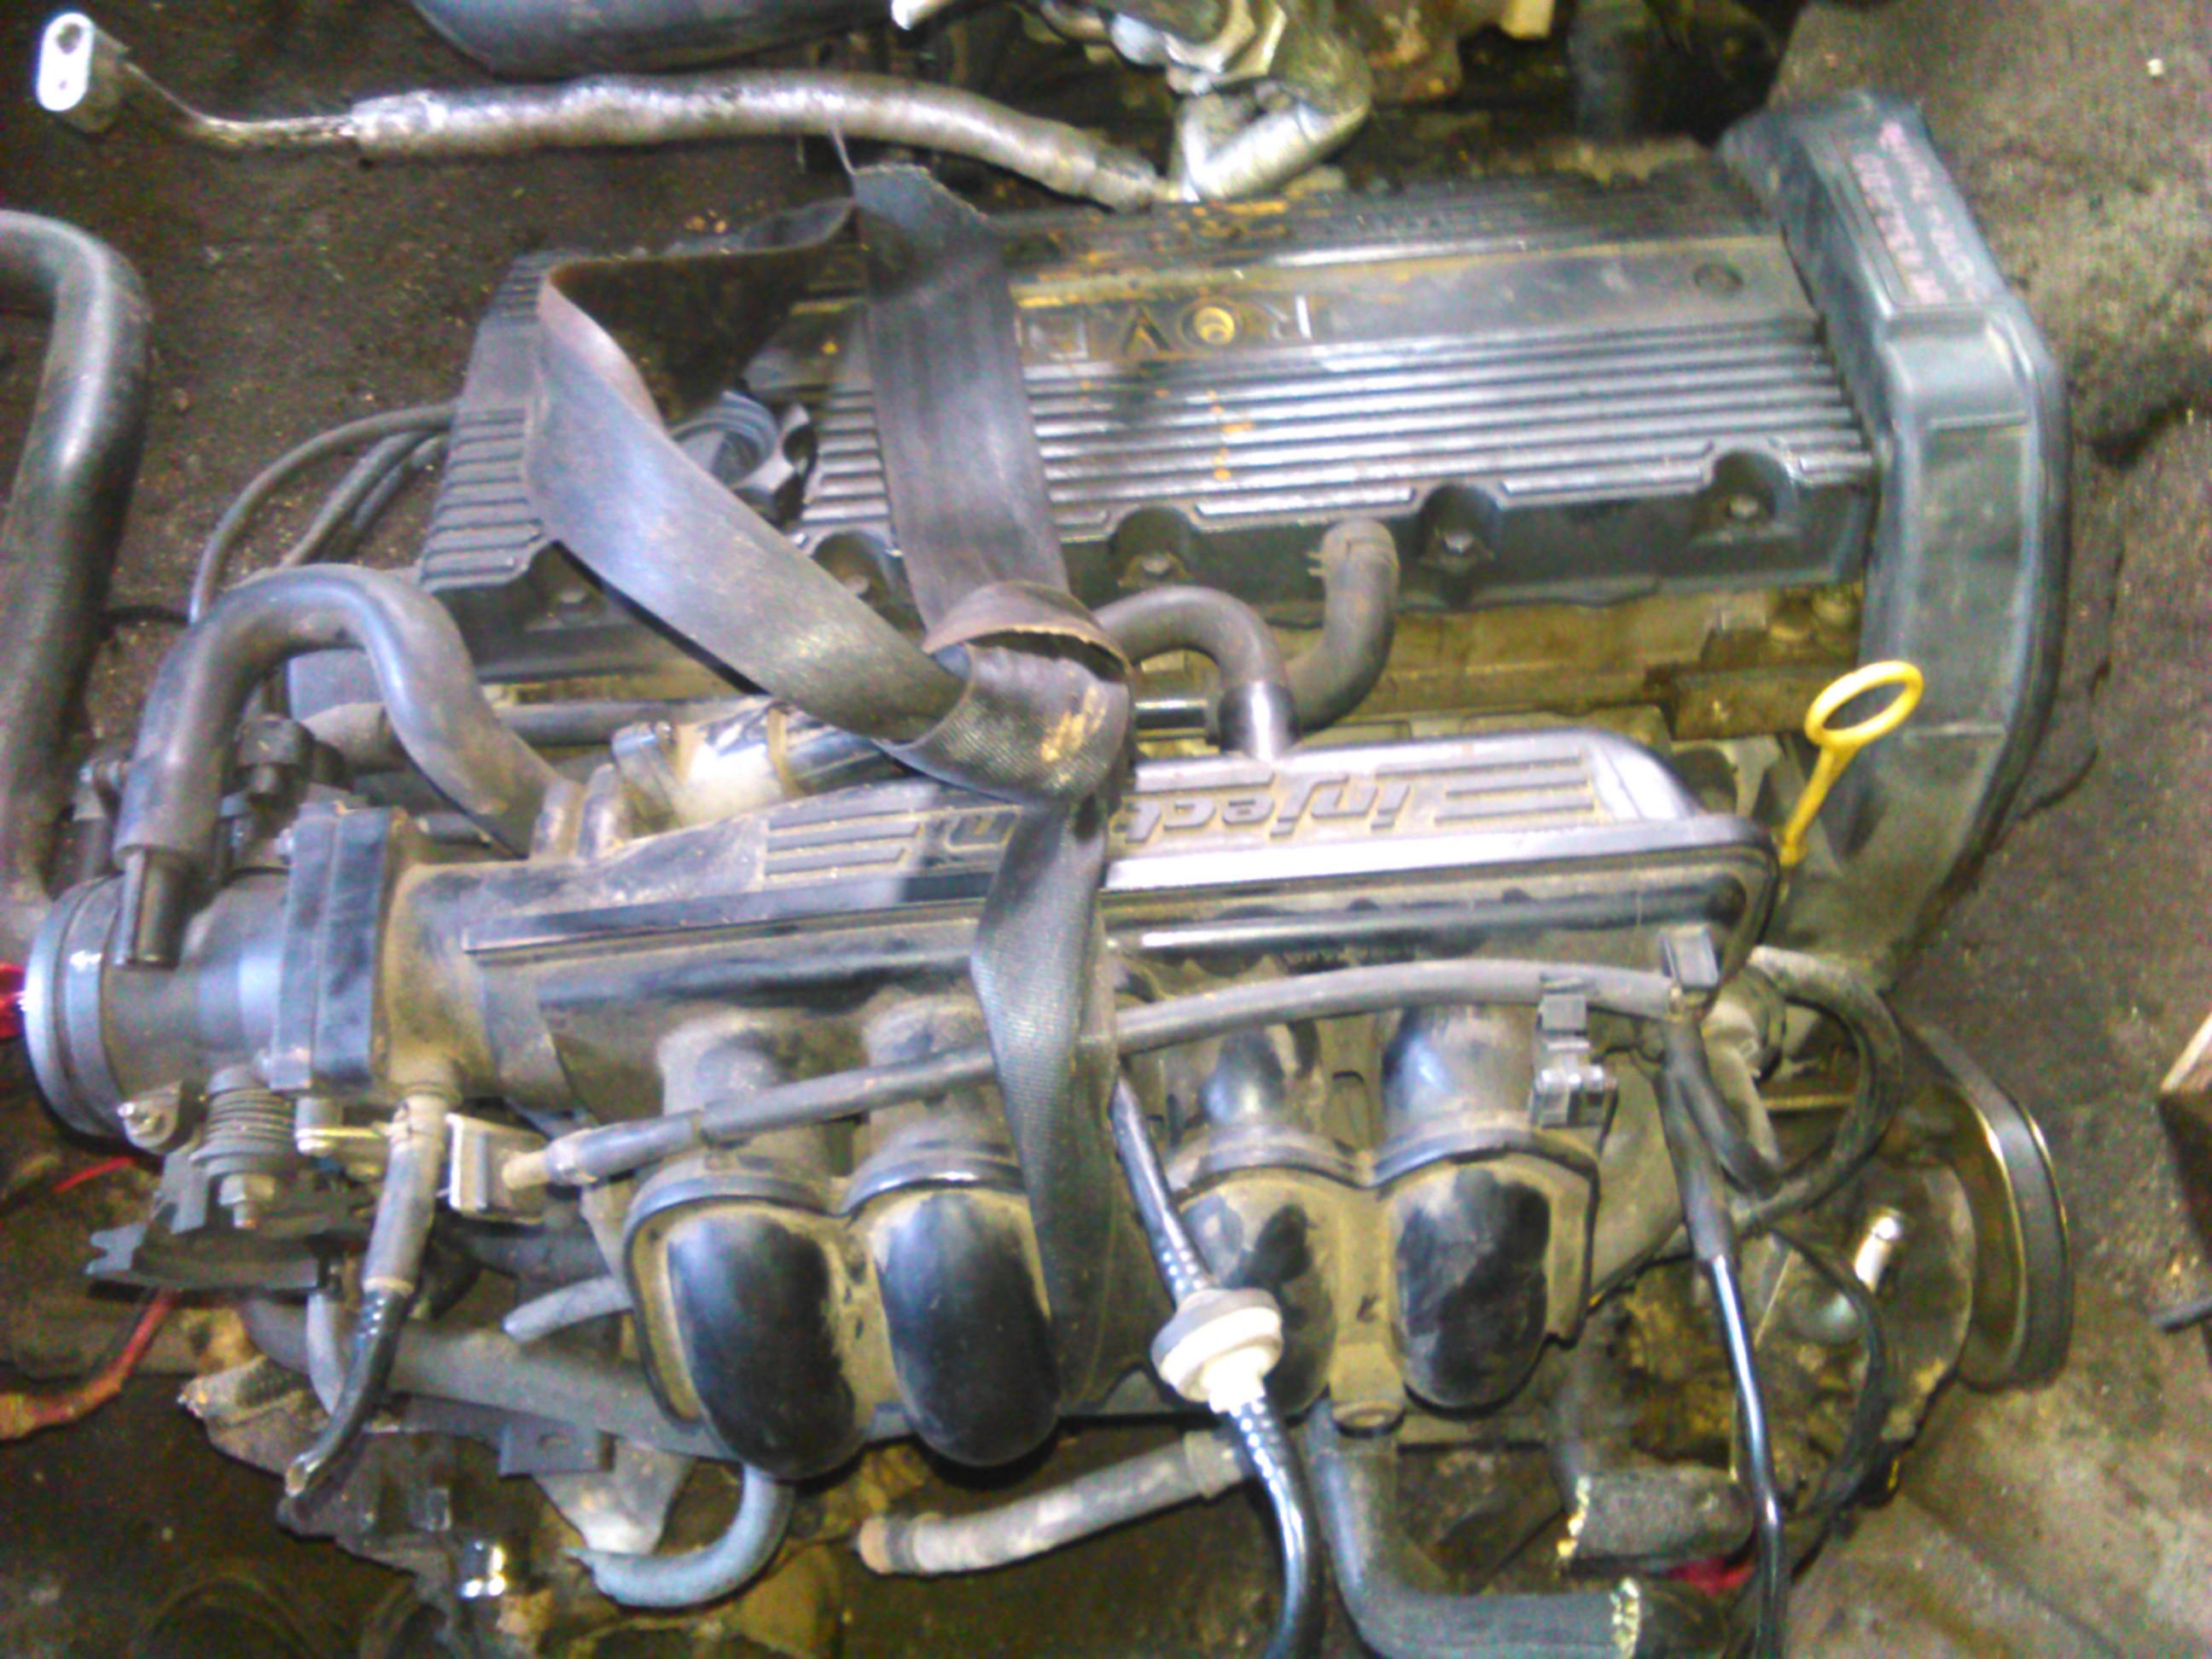 vand , cutie de viteze, rover 45, 1.4, 2000-2005, 86000 km, cod motor 14k4f